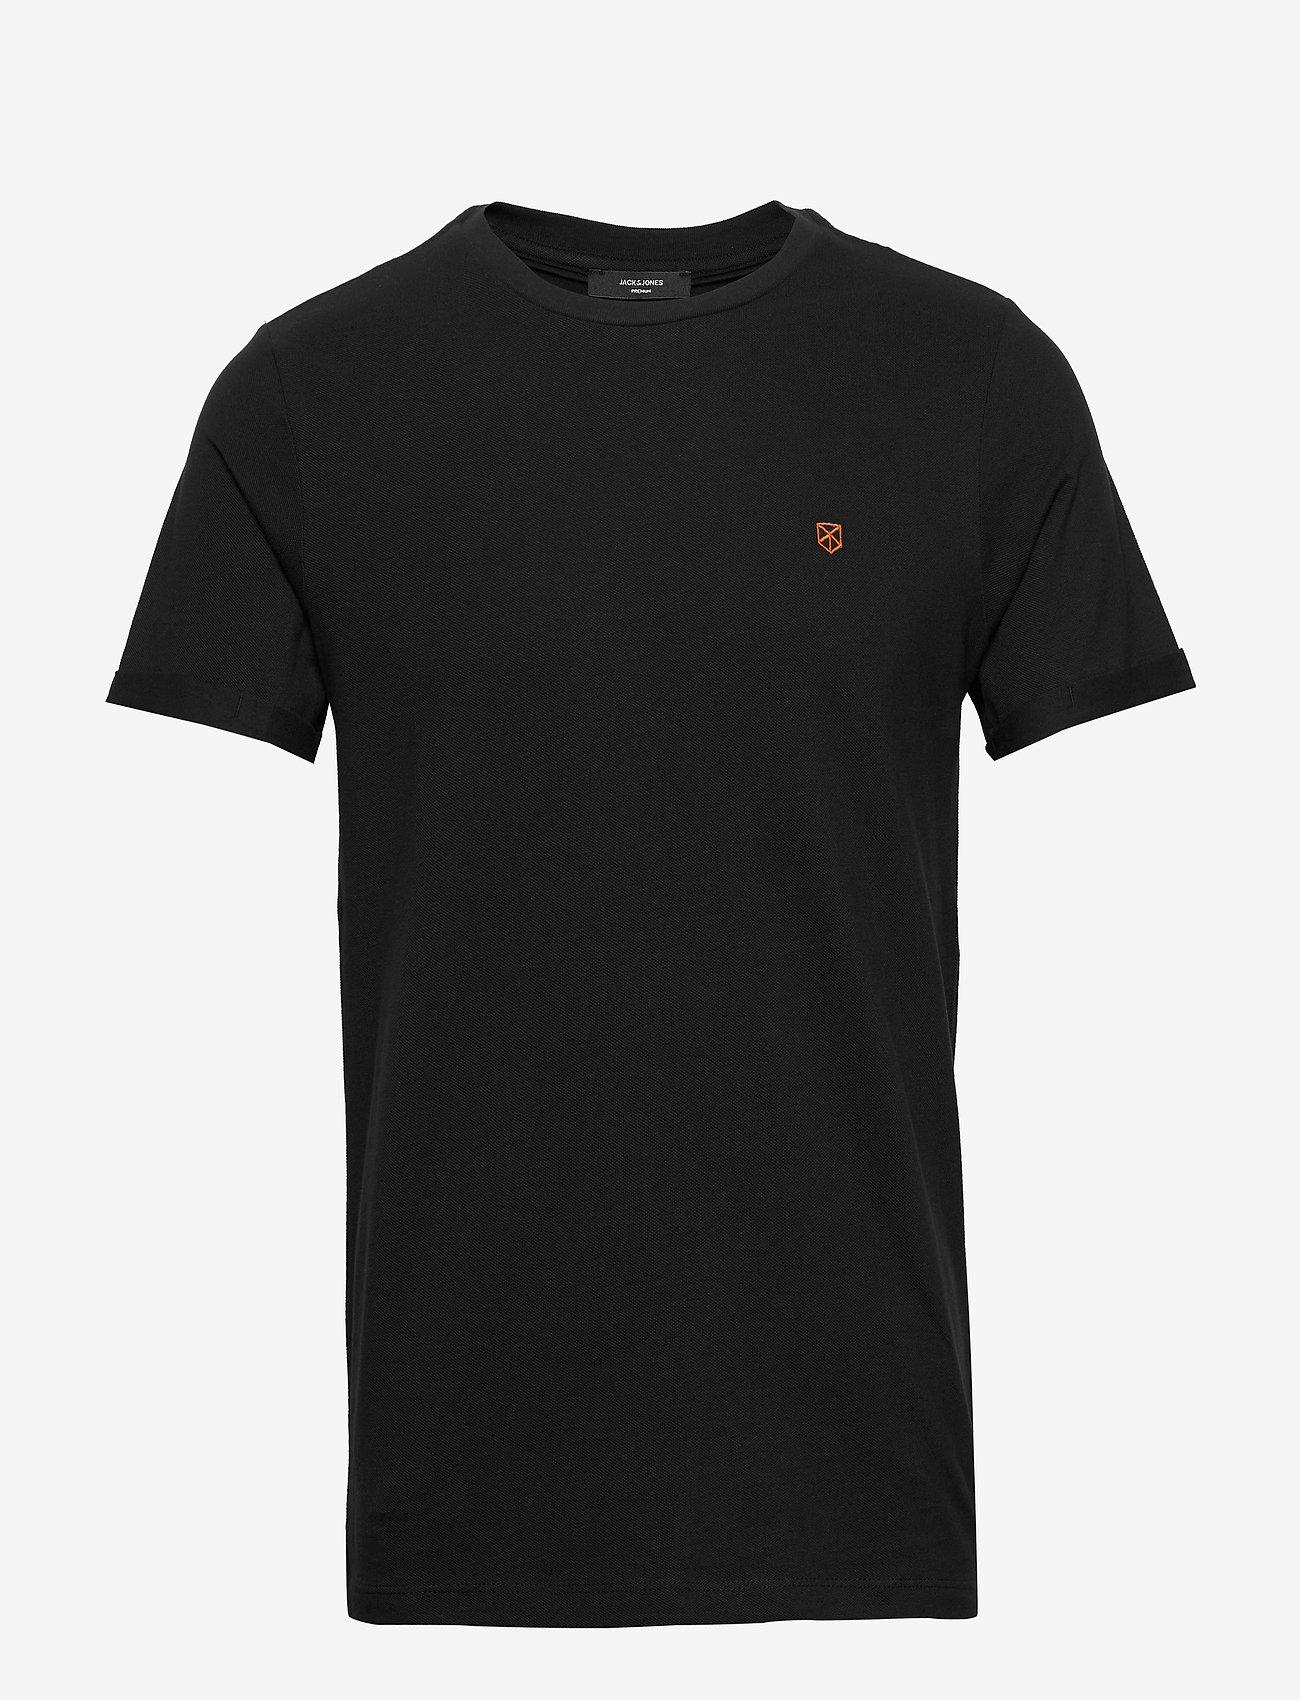 Jack & Jones - JPRBLAHARDY TEE SS CREW NECK STS - t-shirts basiques - black - 0